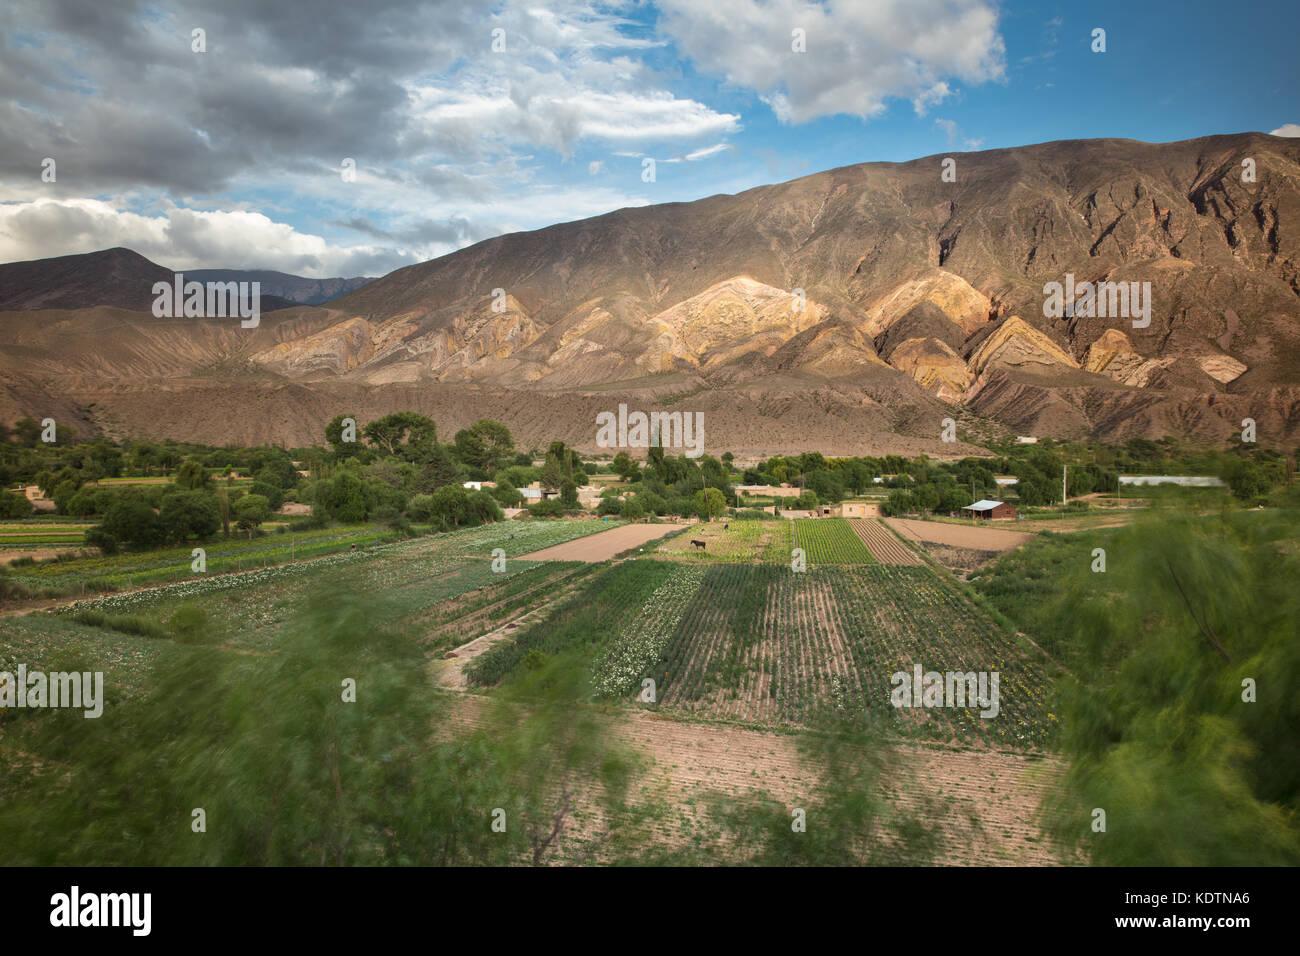 Farmland near Maimará, with the 'Painter's Palette' hills beyond, Quebrada de Humahuaca, Jujuy - Stock Image